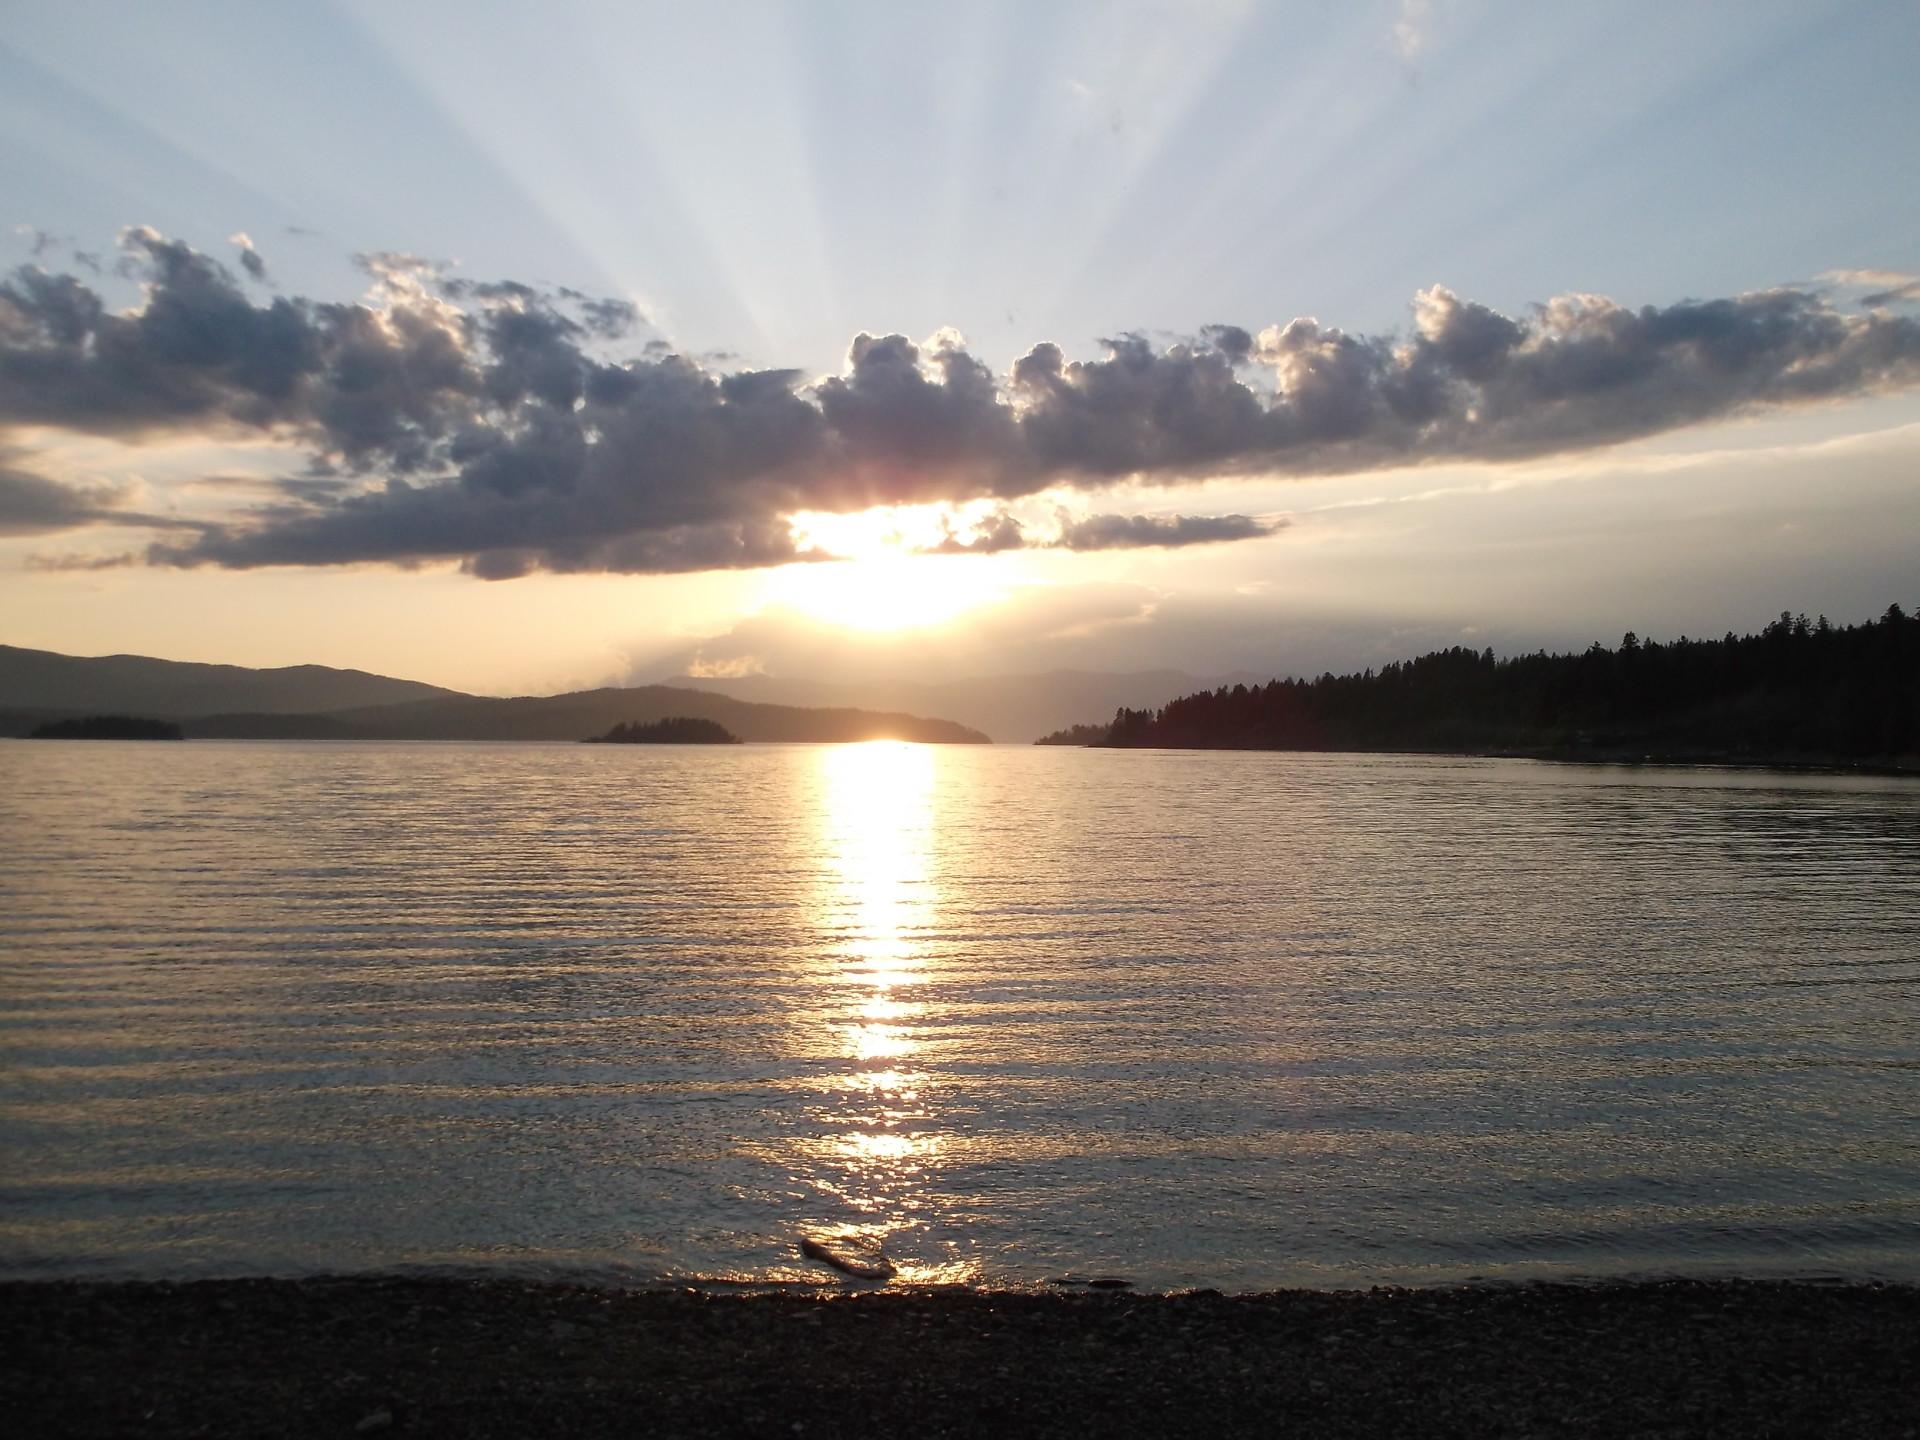 Idaho, Truth, Freedom, Love, Nature, Sunset